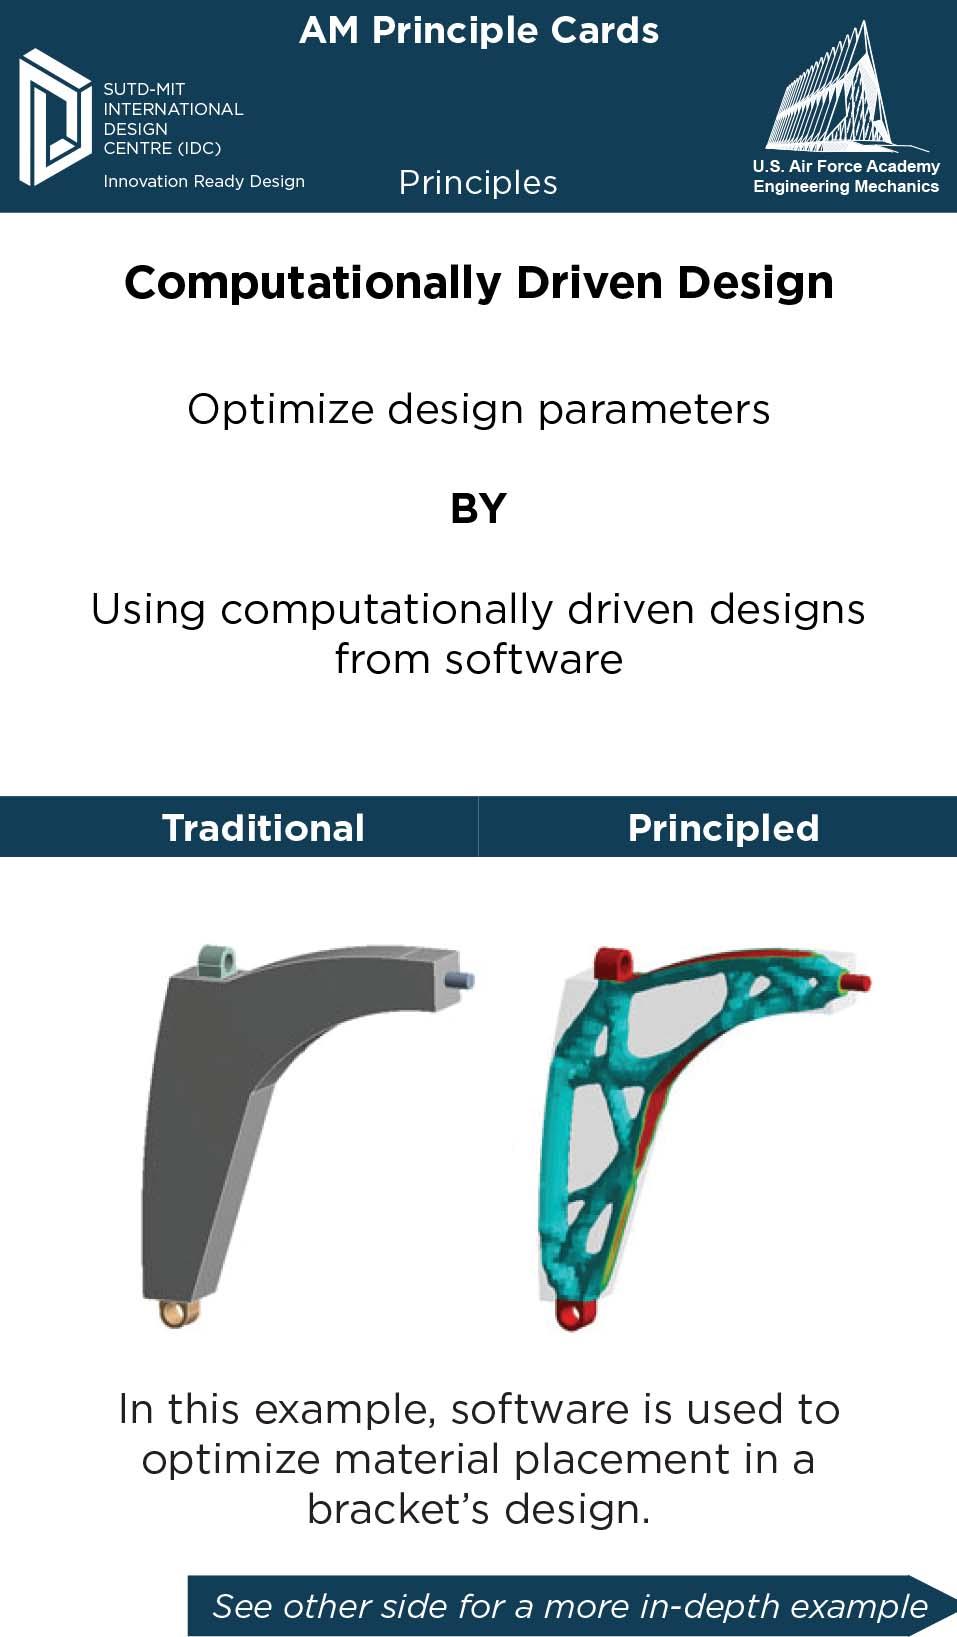 Design Inspiration Cards for 3D Printing